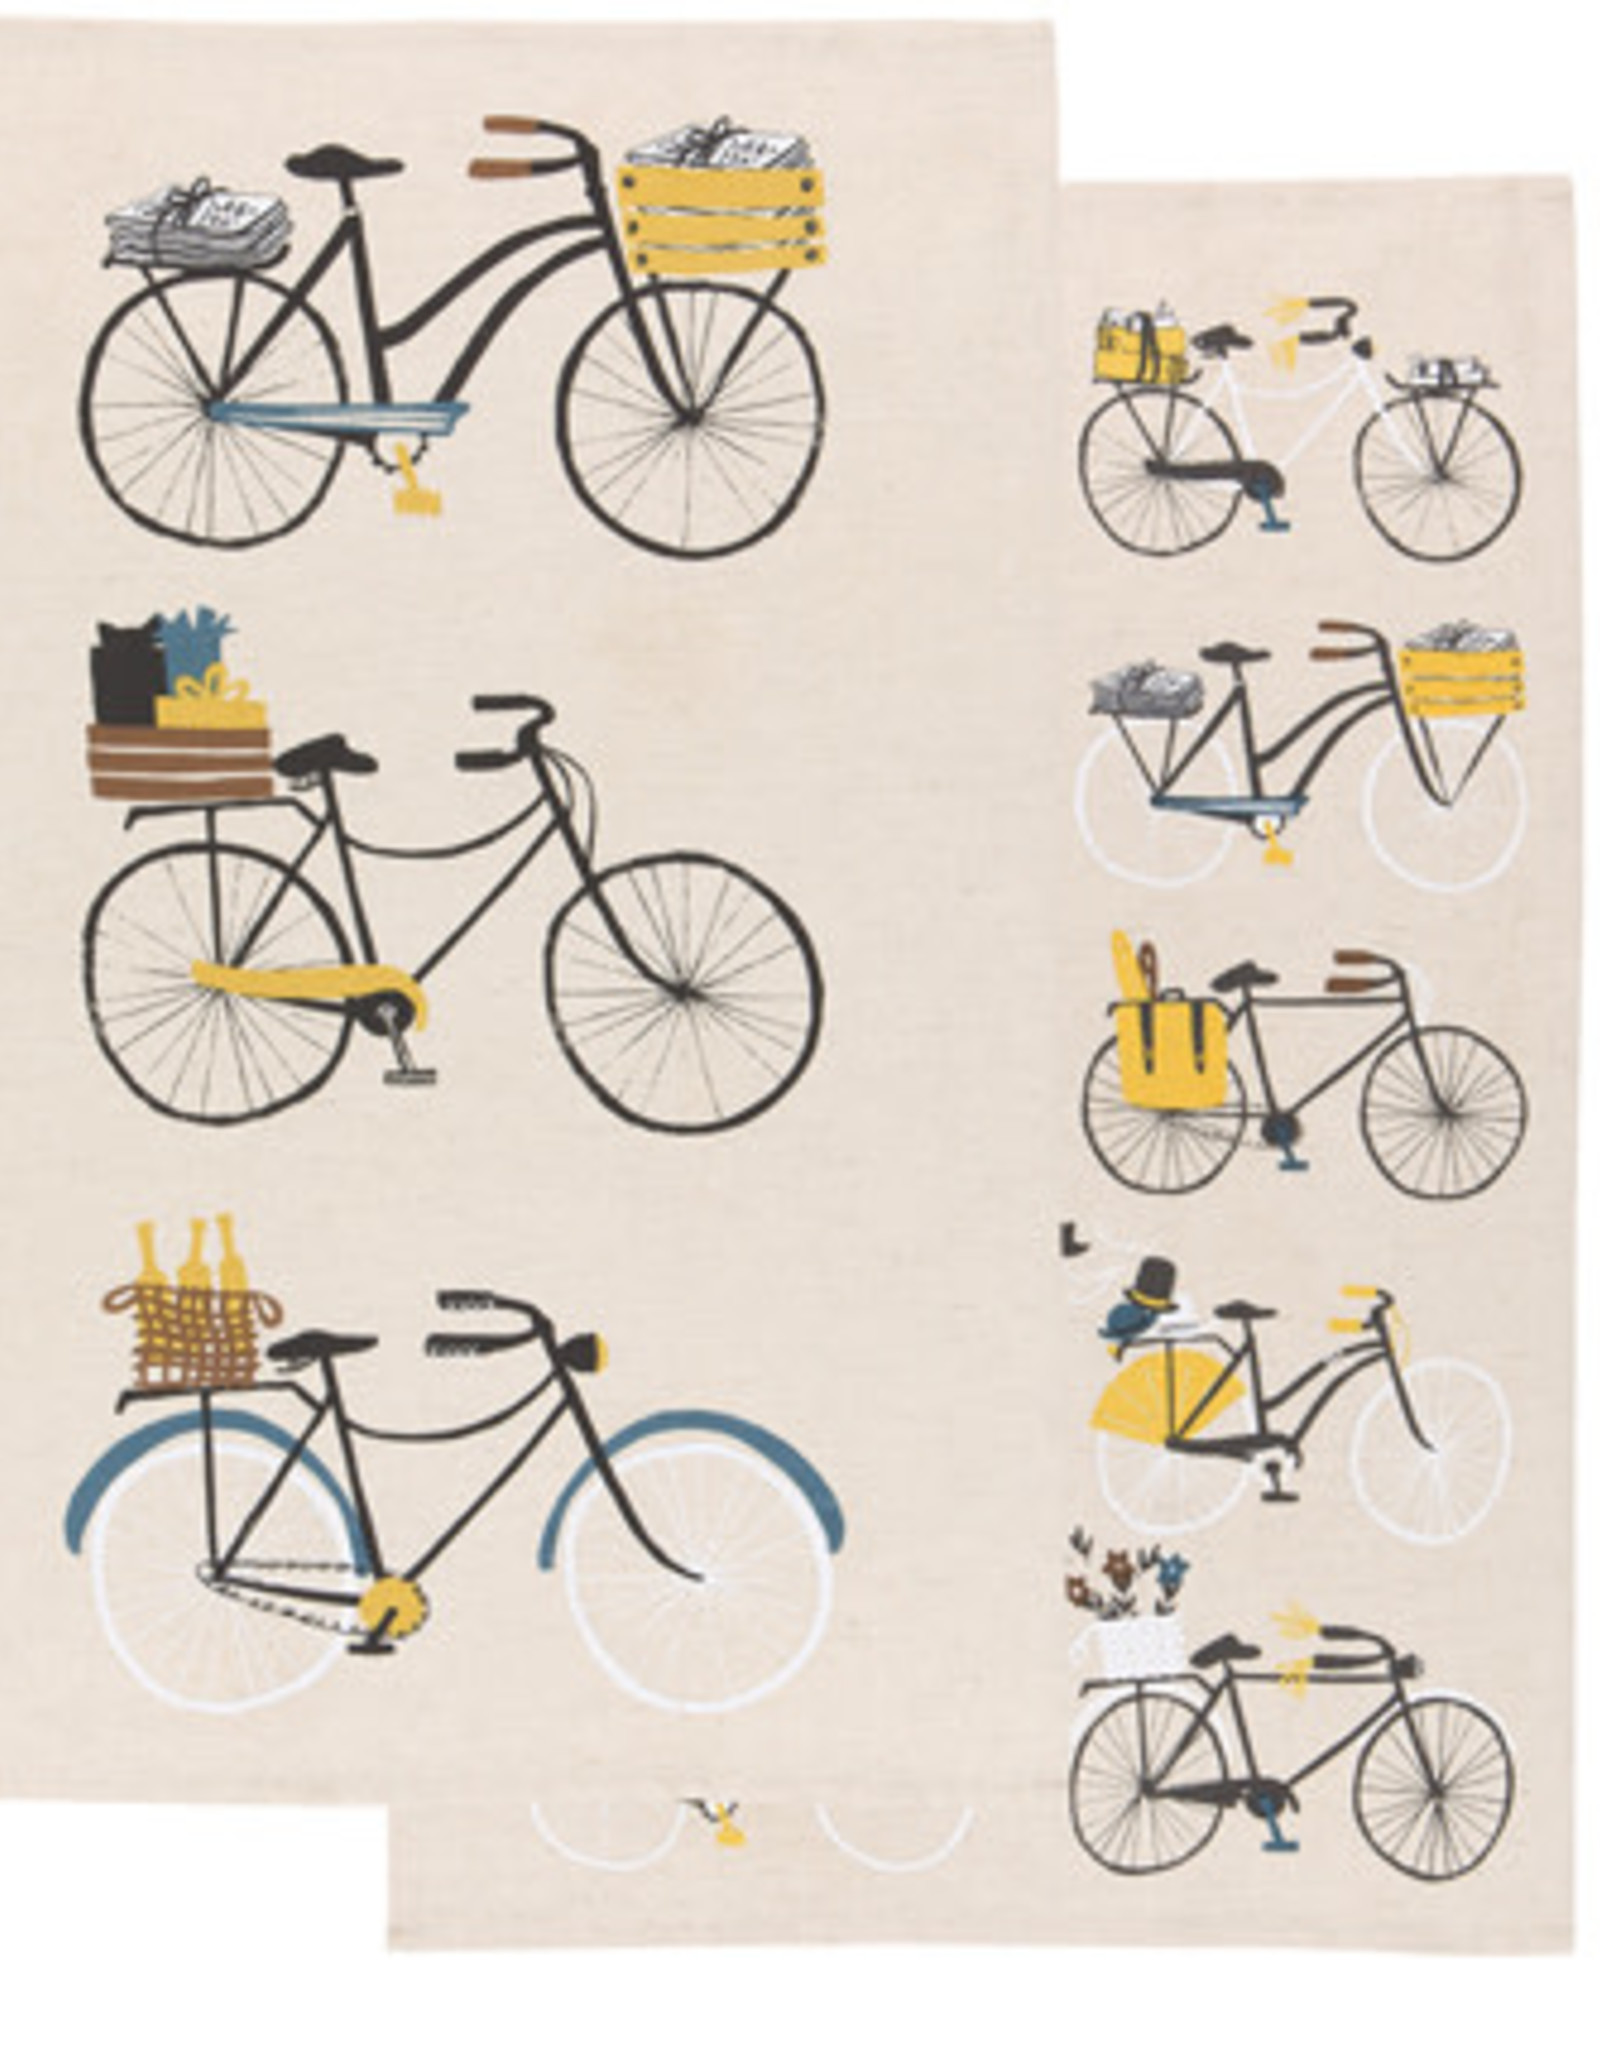 Danica Danica - Bicicletta Dishtowel Set of 2